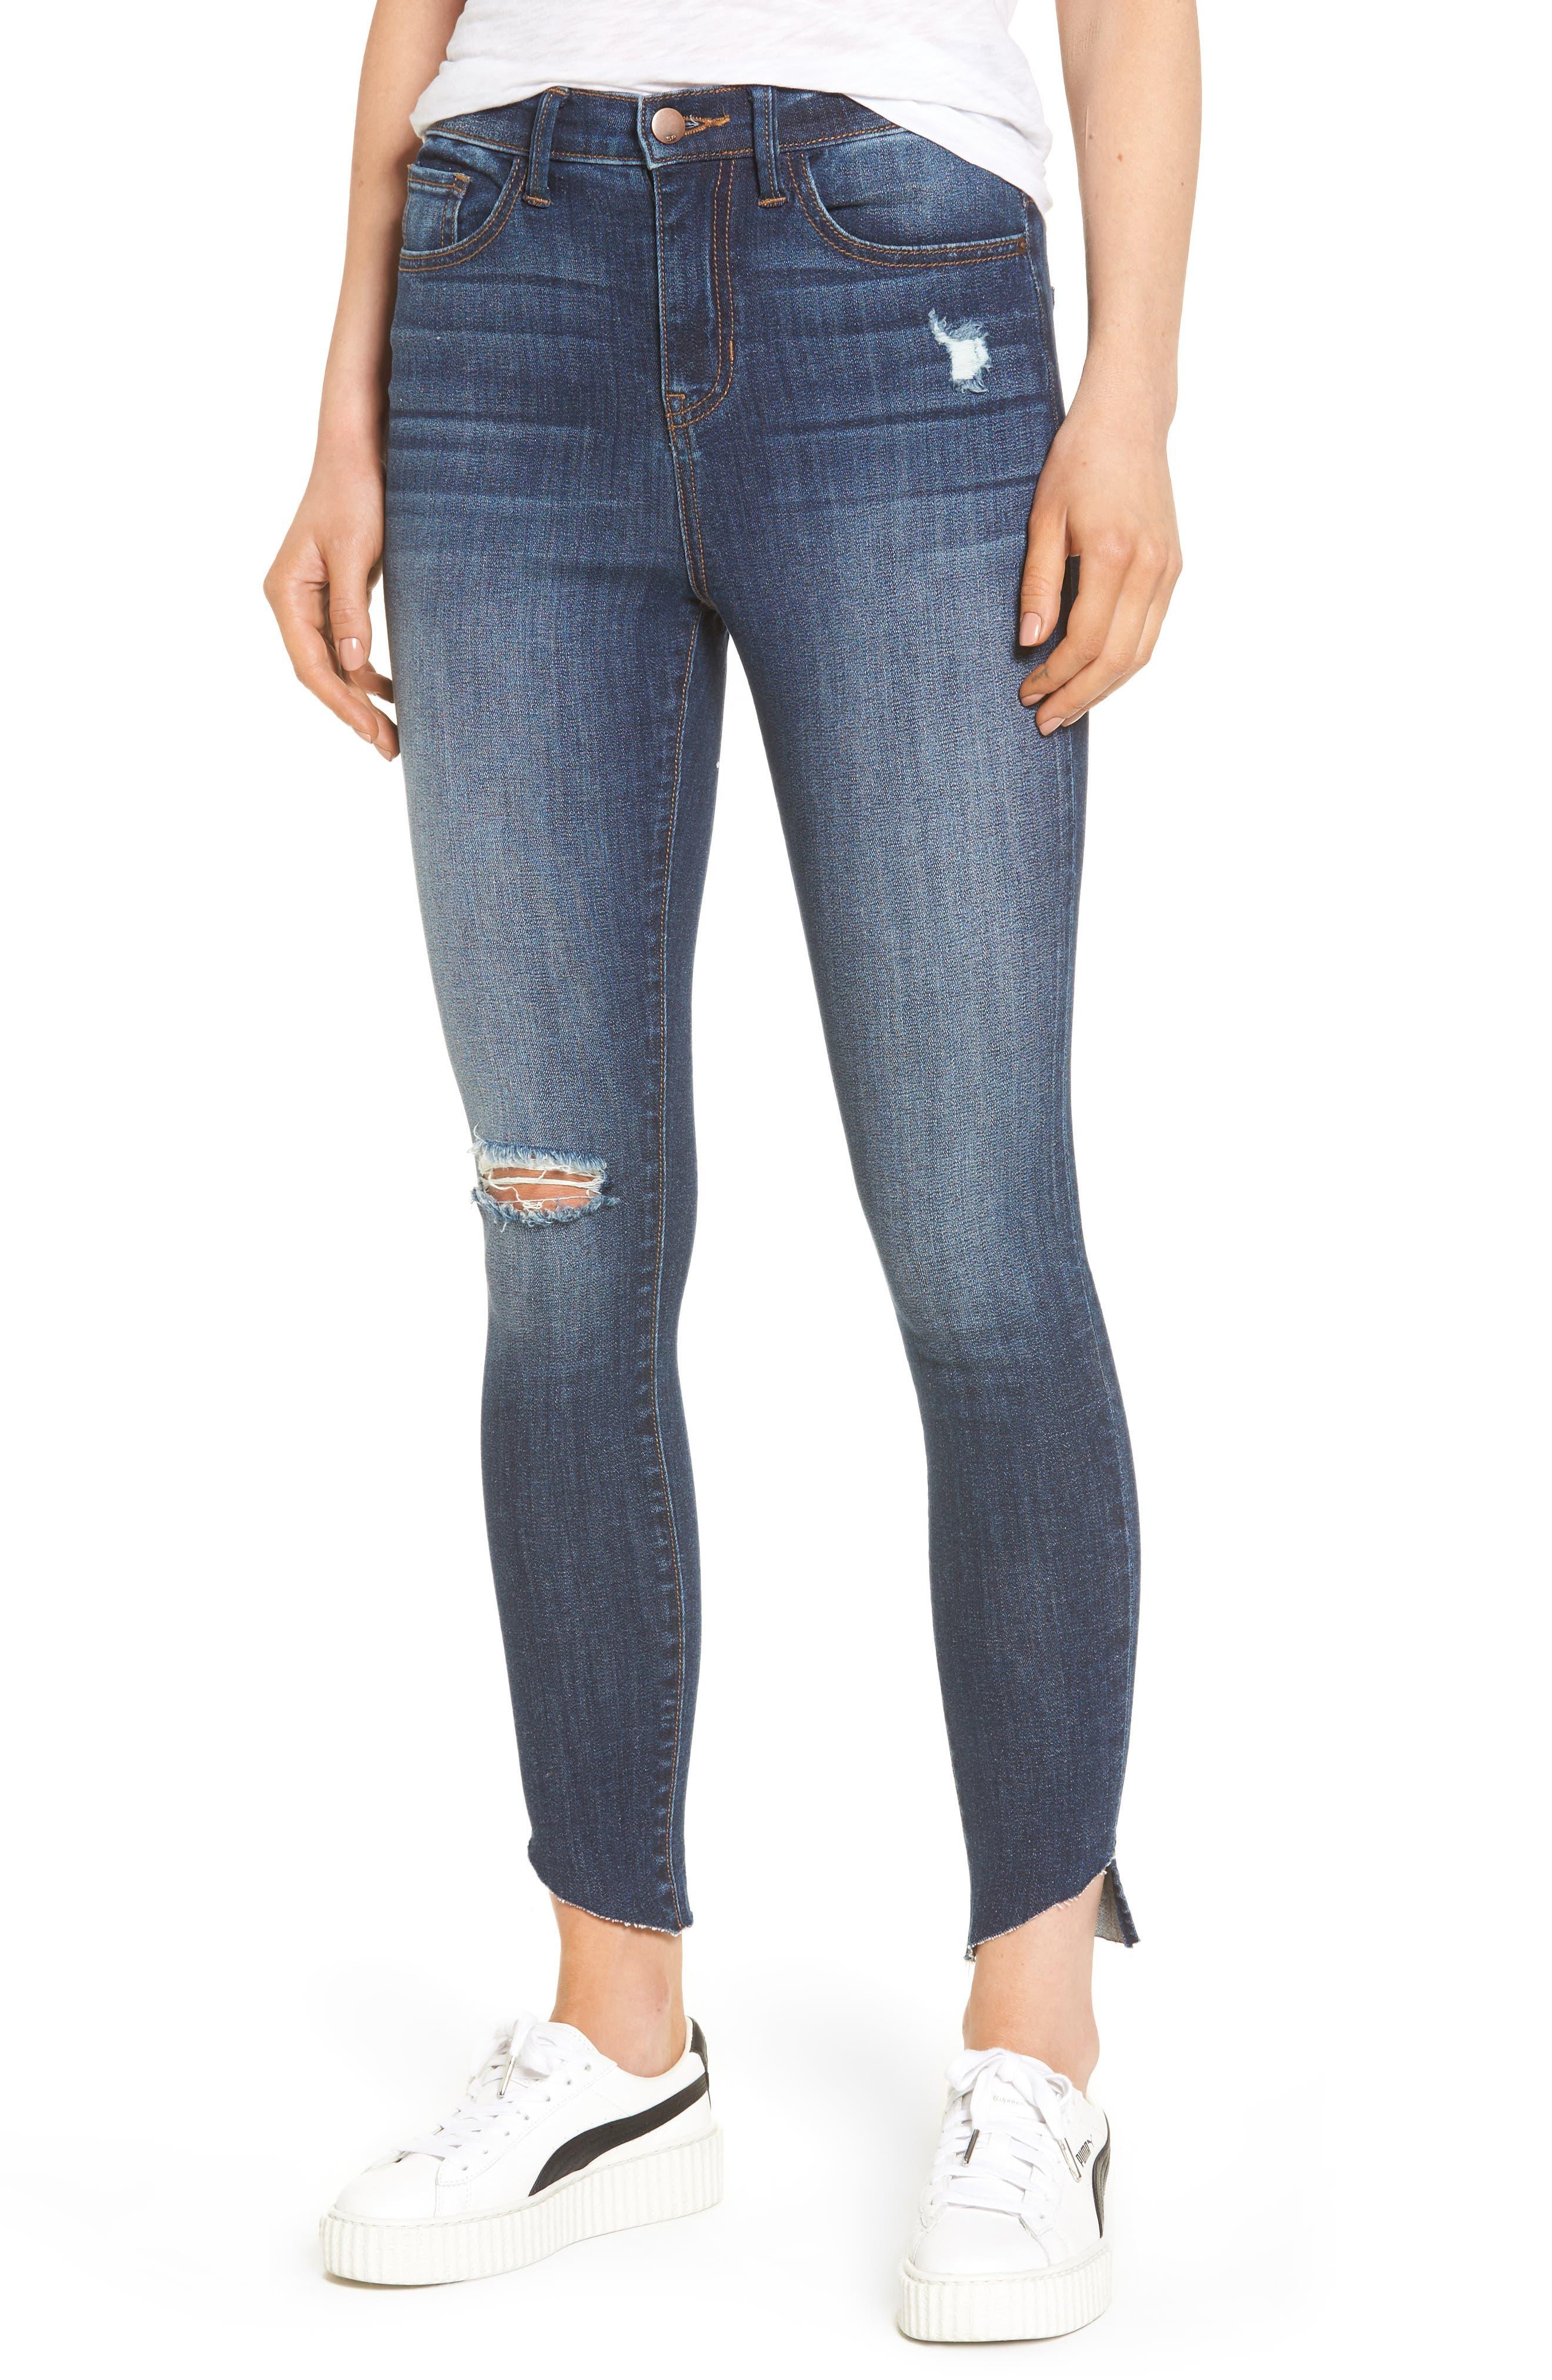 Alternate Image 1 Selected - SP Black Angled Step Hem High Waist Skinny Jeans